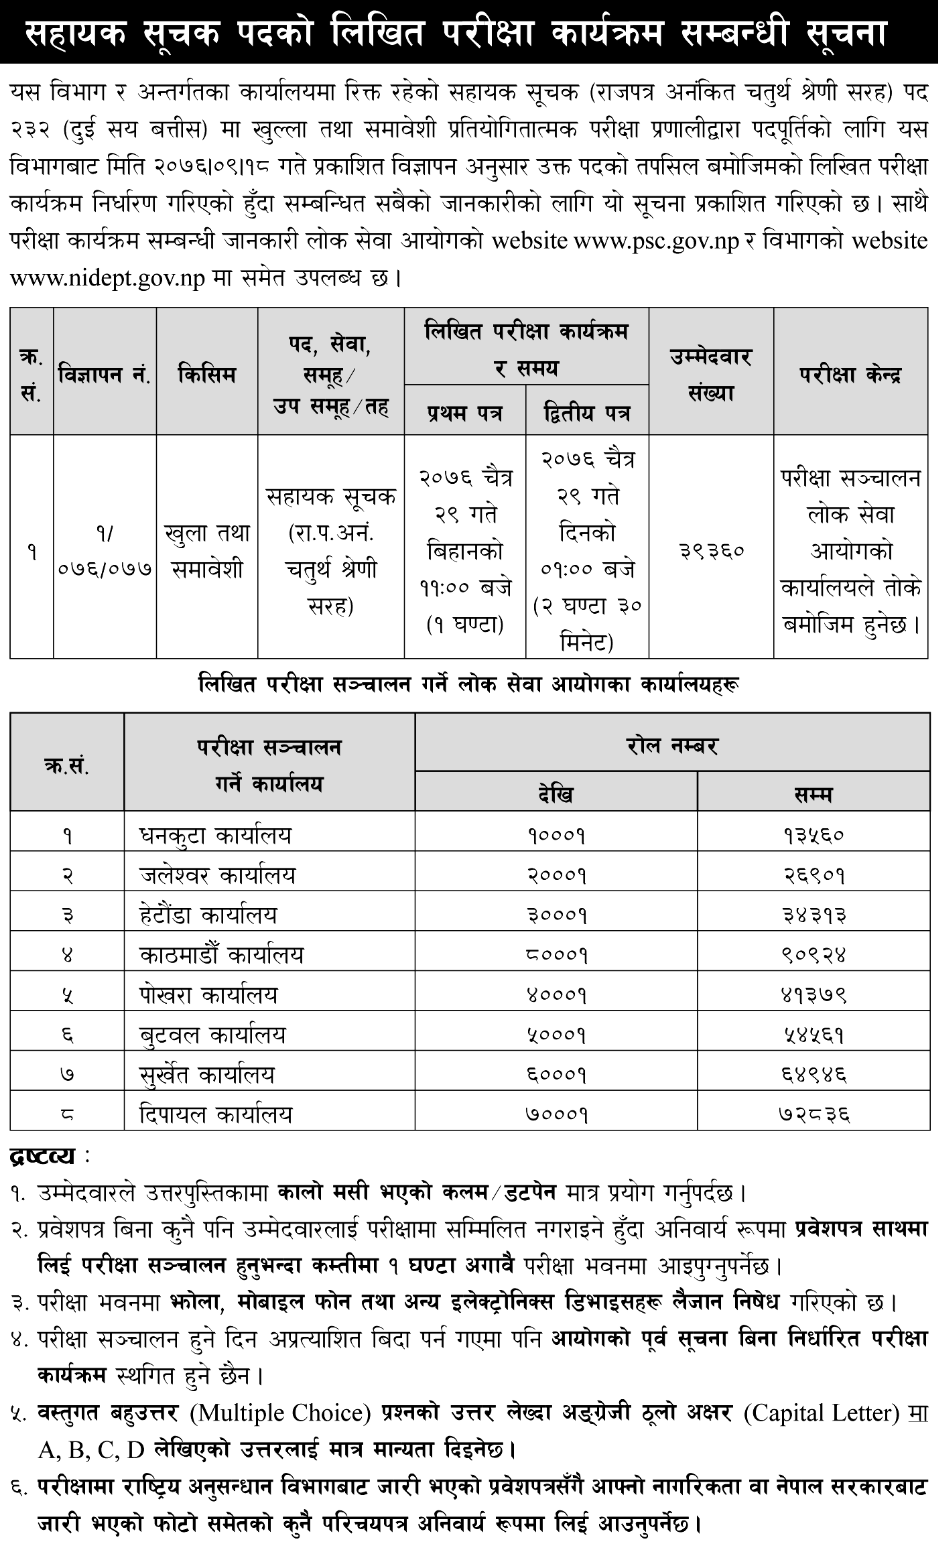 Written Exam Noticeat Rastriya Anusandhan Bibhag (राष्ट्रिय अनुसन्धान विभाग)